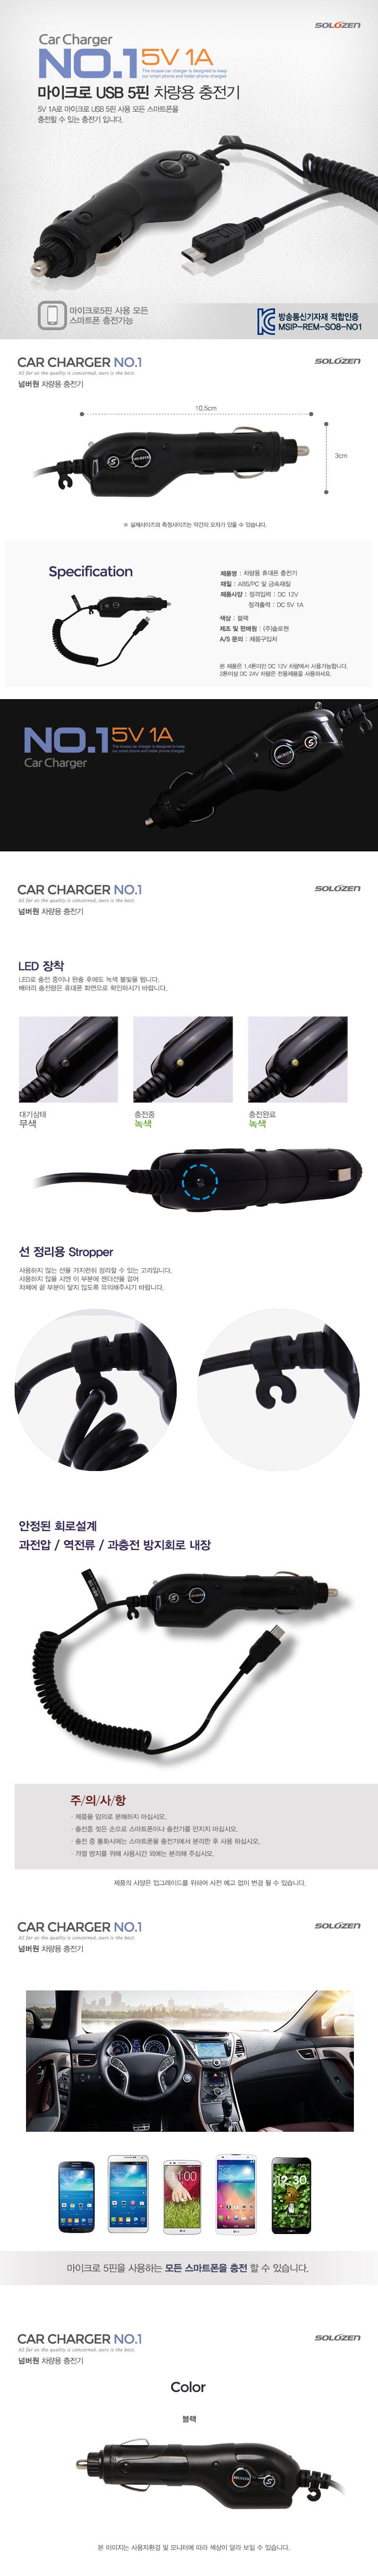 ch-33-info_gift.jpg